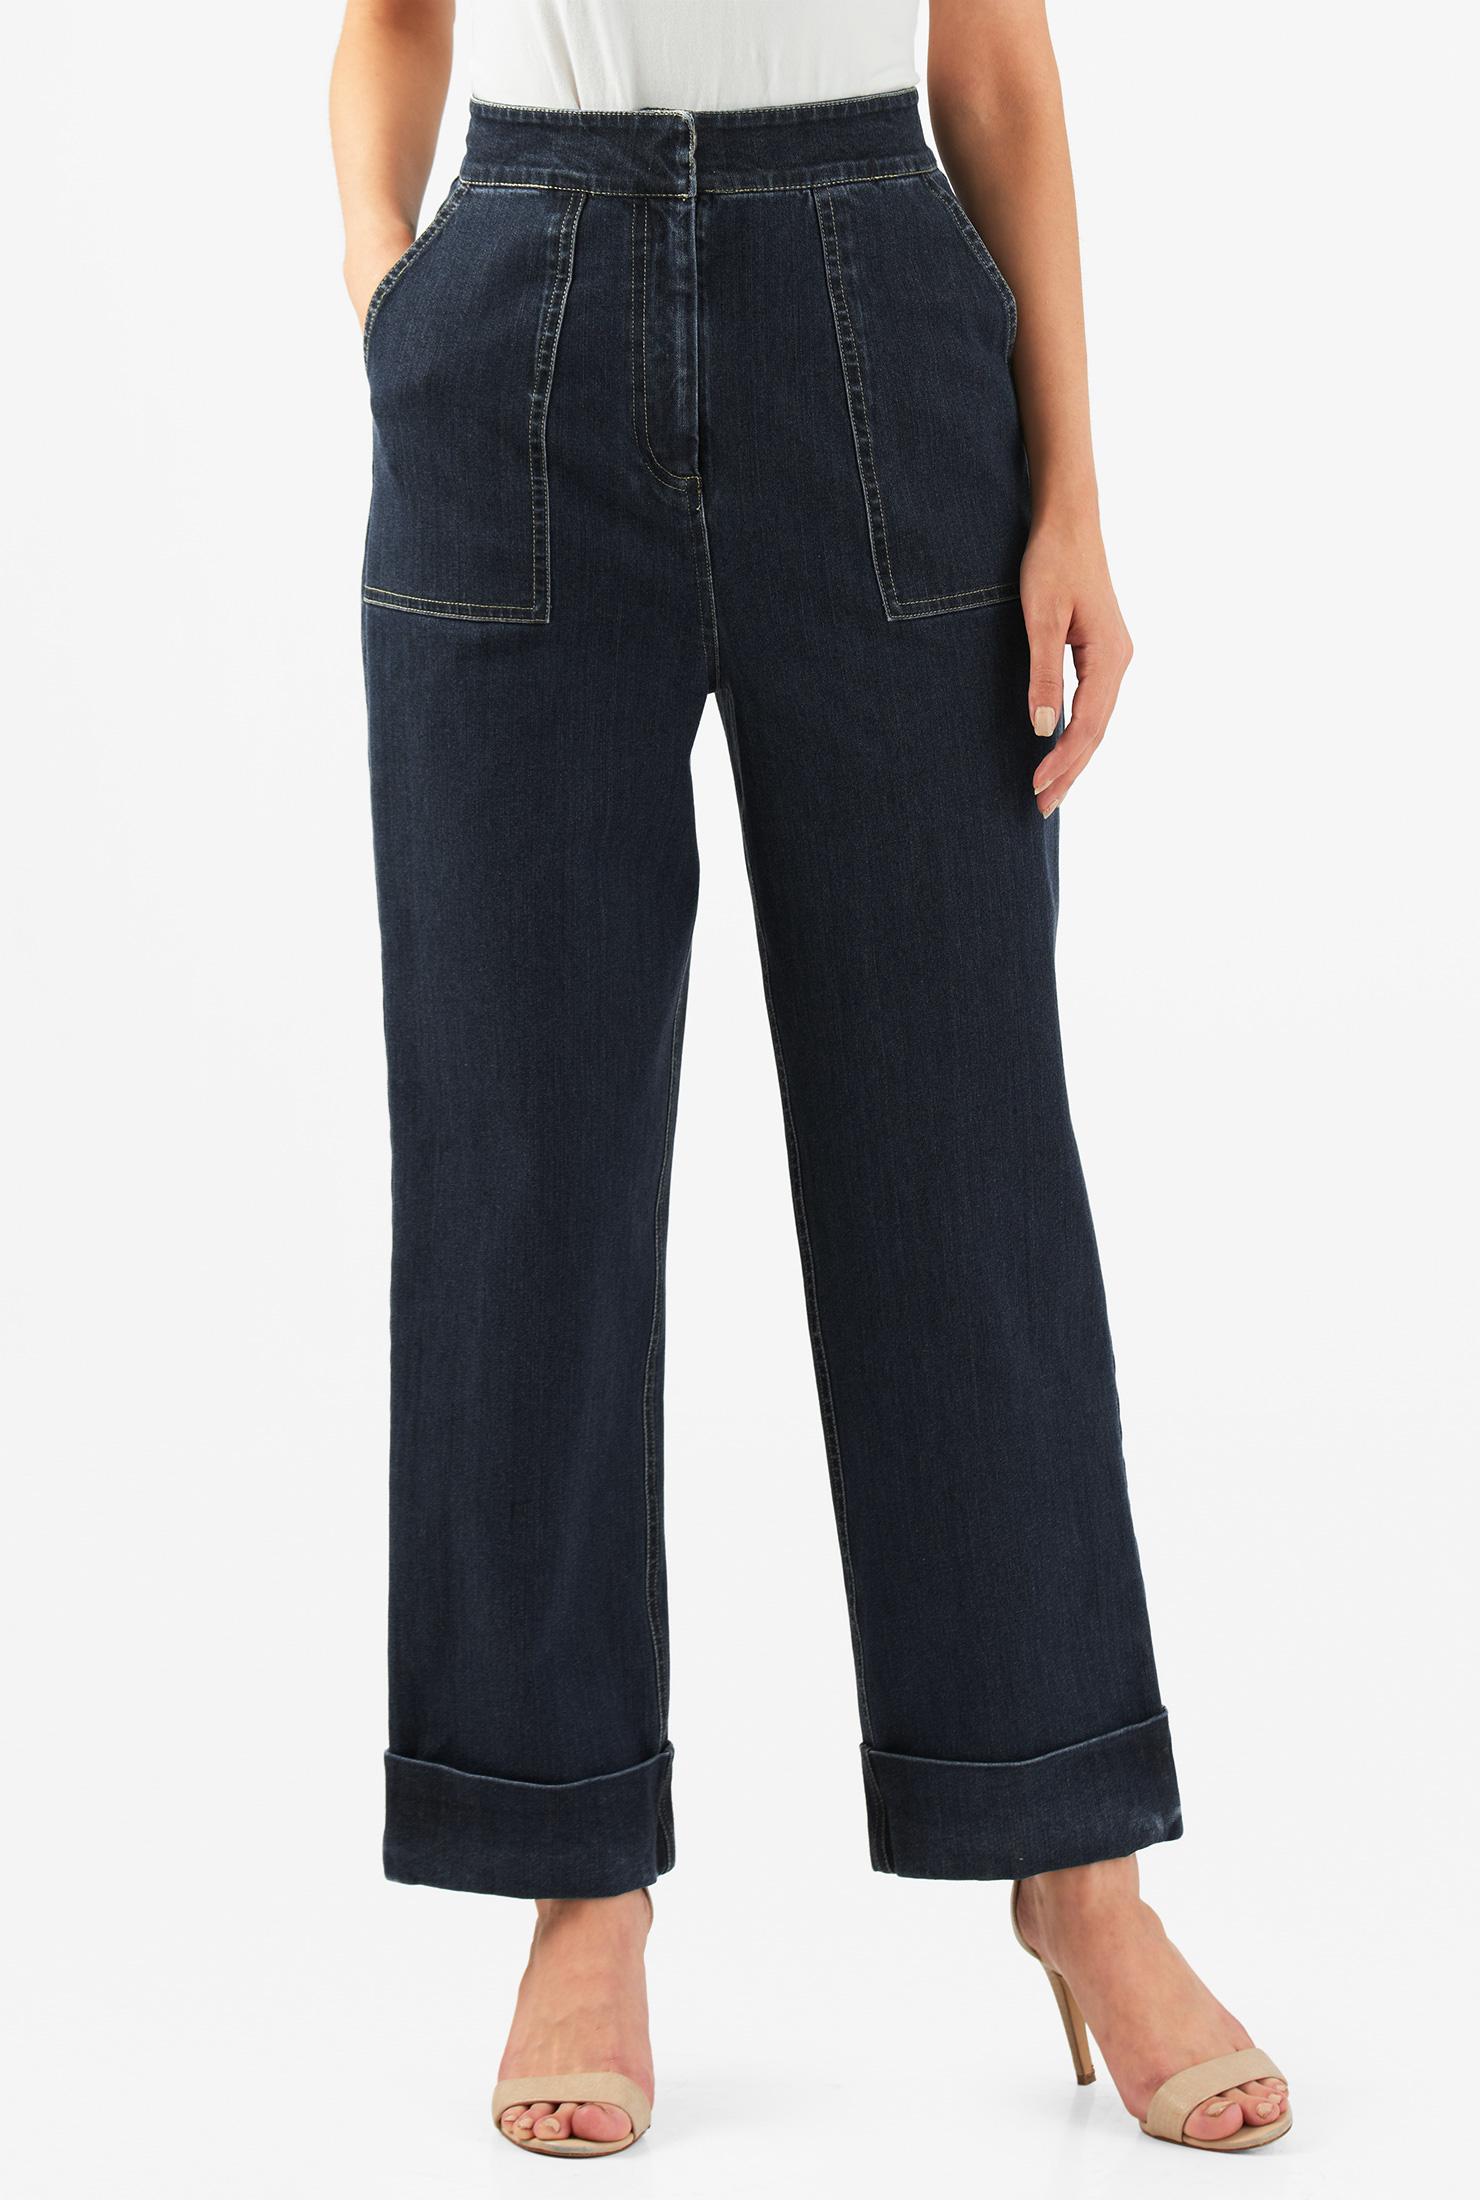 1950s Pants & Jeans- High Waist, Wide Leg, Capri, Pedal Pushers High rise deep indigo denim crop jeans $84.95 AT vintagedancer.com